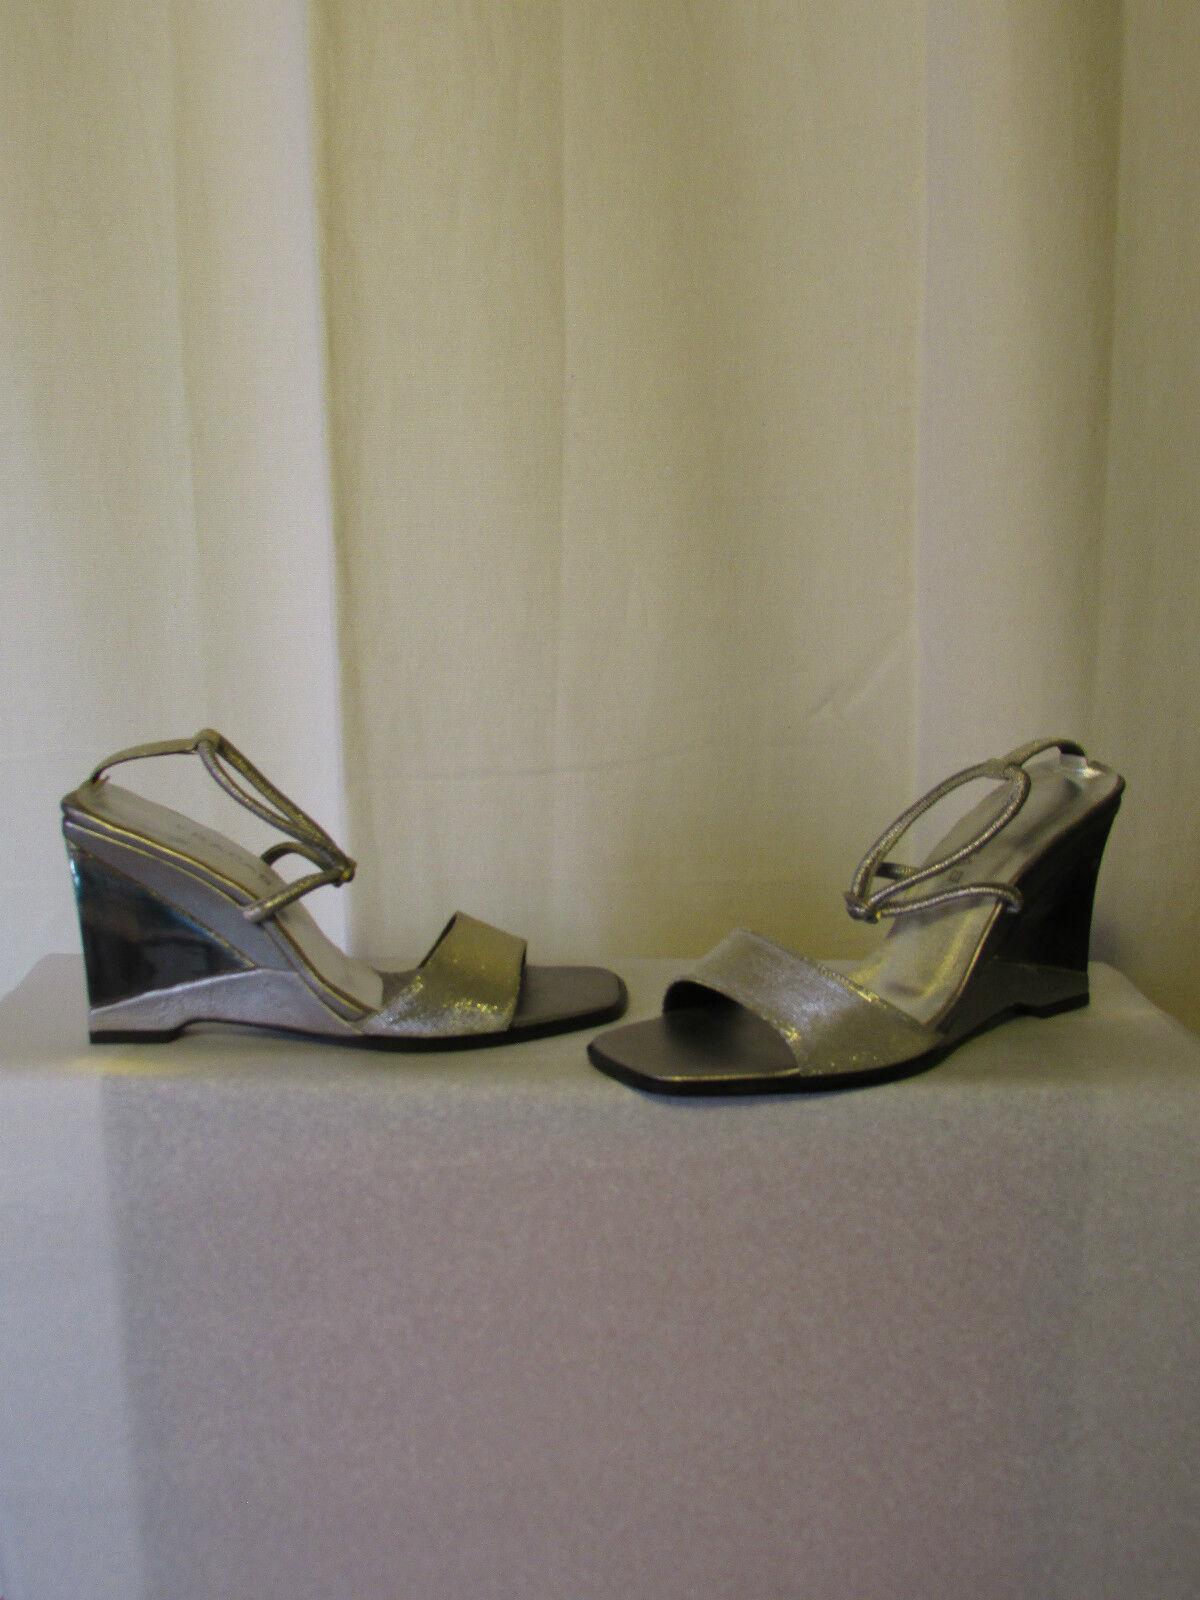 Keil Sandalen Sandalen Sandalen Absturz Silber 39 c31741